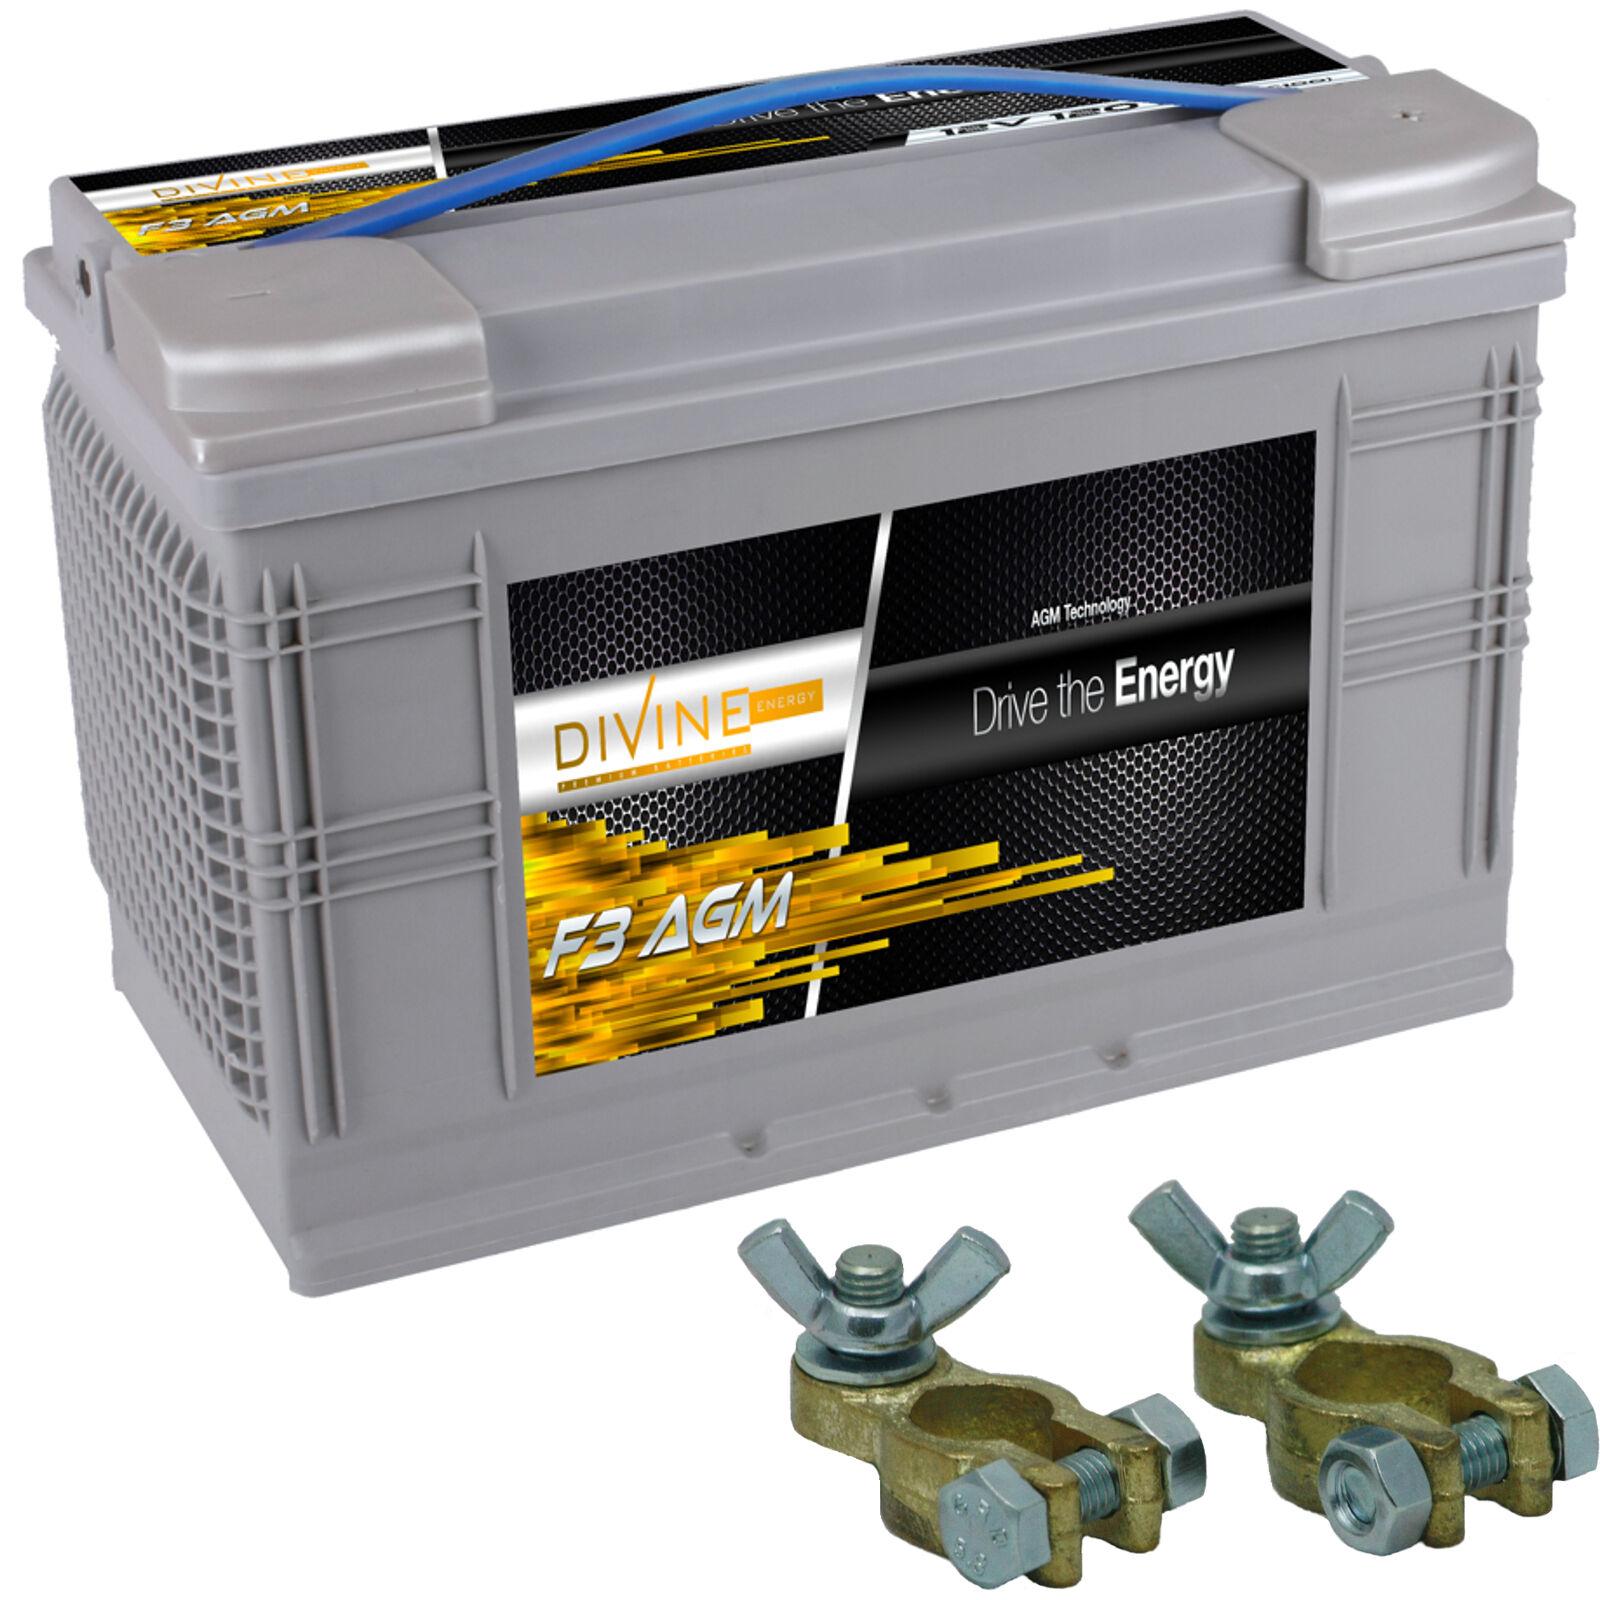 Divine F3 120Ah AGM Stiefel Antrieb Batterie mit Batterieklemmen ersetzt ersetzt Batterieklemmen 95, 110ah 712ea1